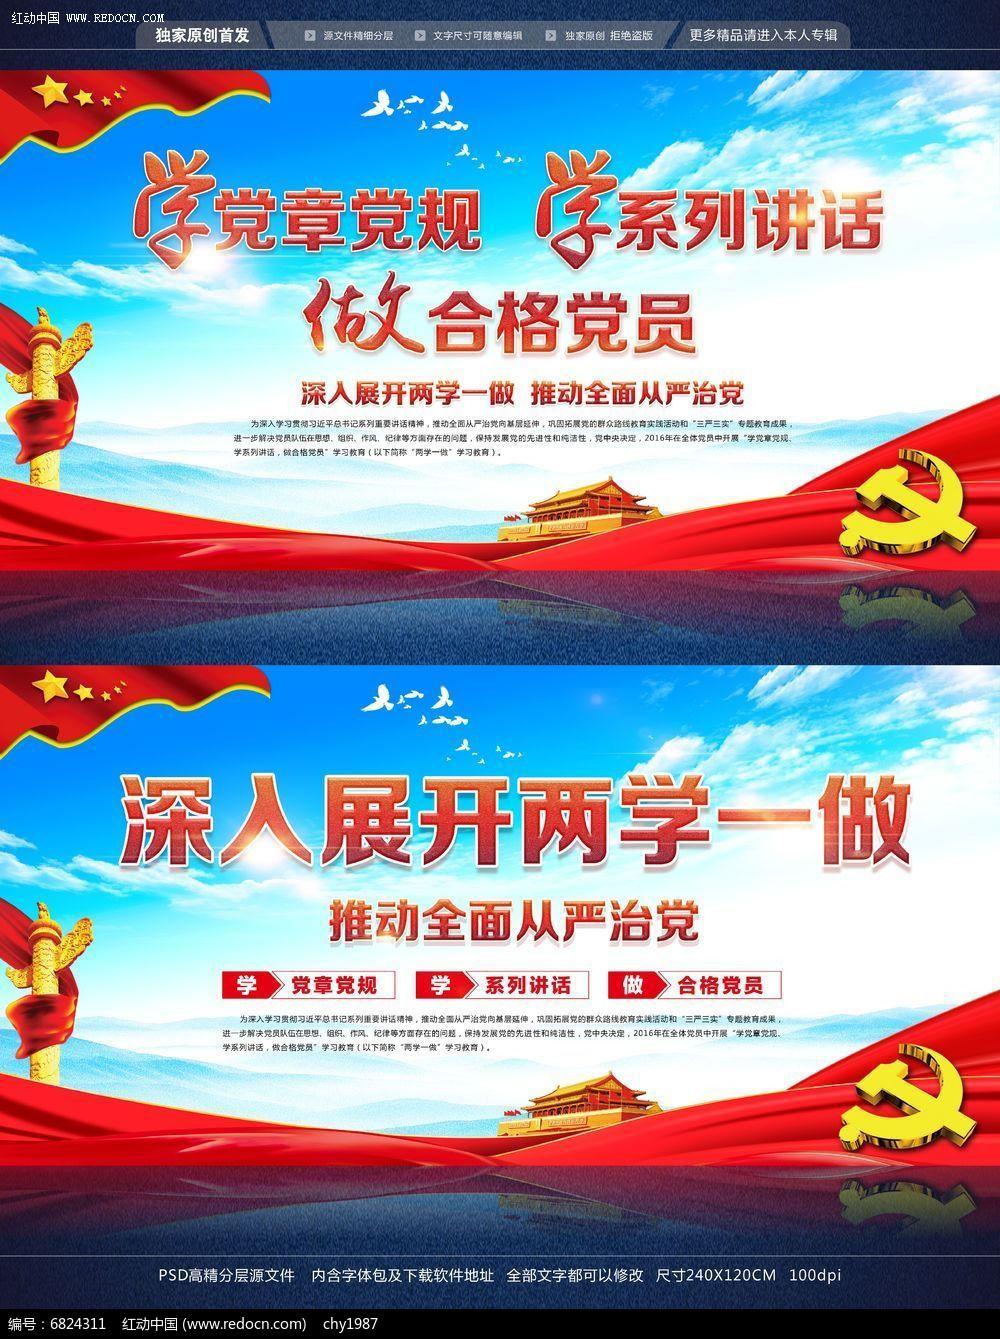 liangxueyizuozhanban_6824311.jpg